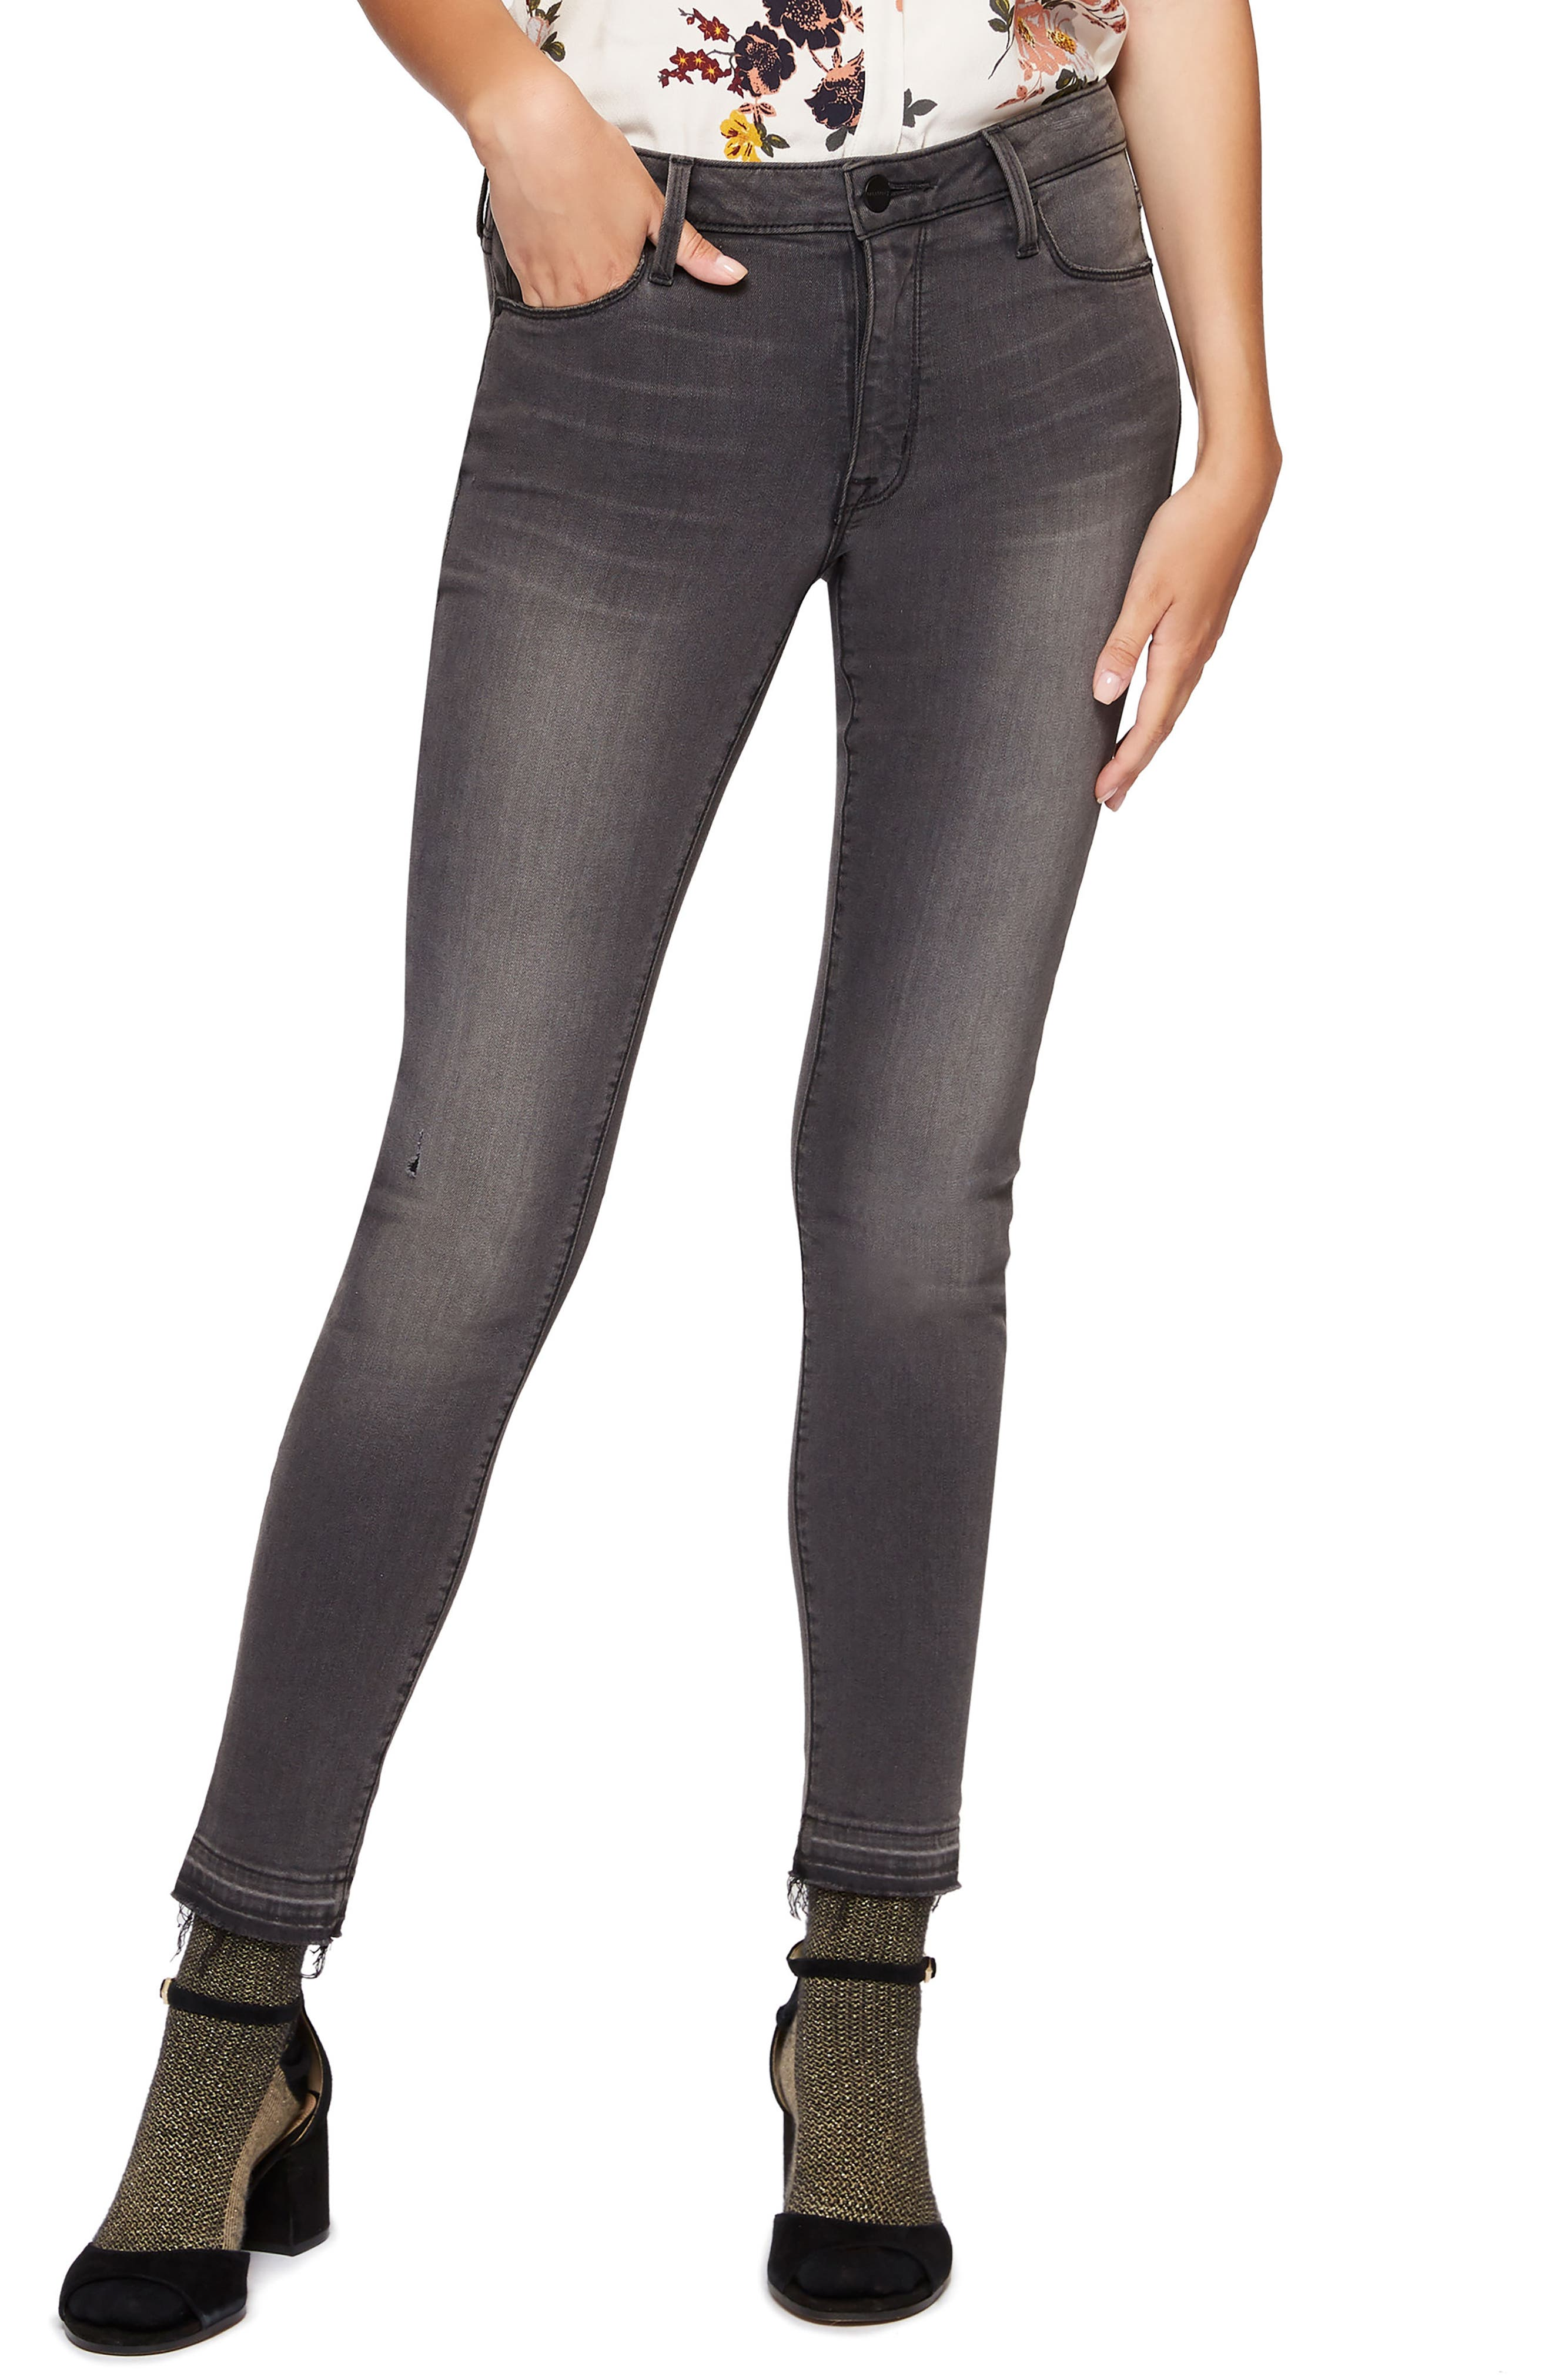 Alternate Image 1 Selected - Sanctuary Robbie Release Hem Ankle Skinny Jeans (Audrey)